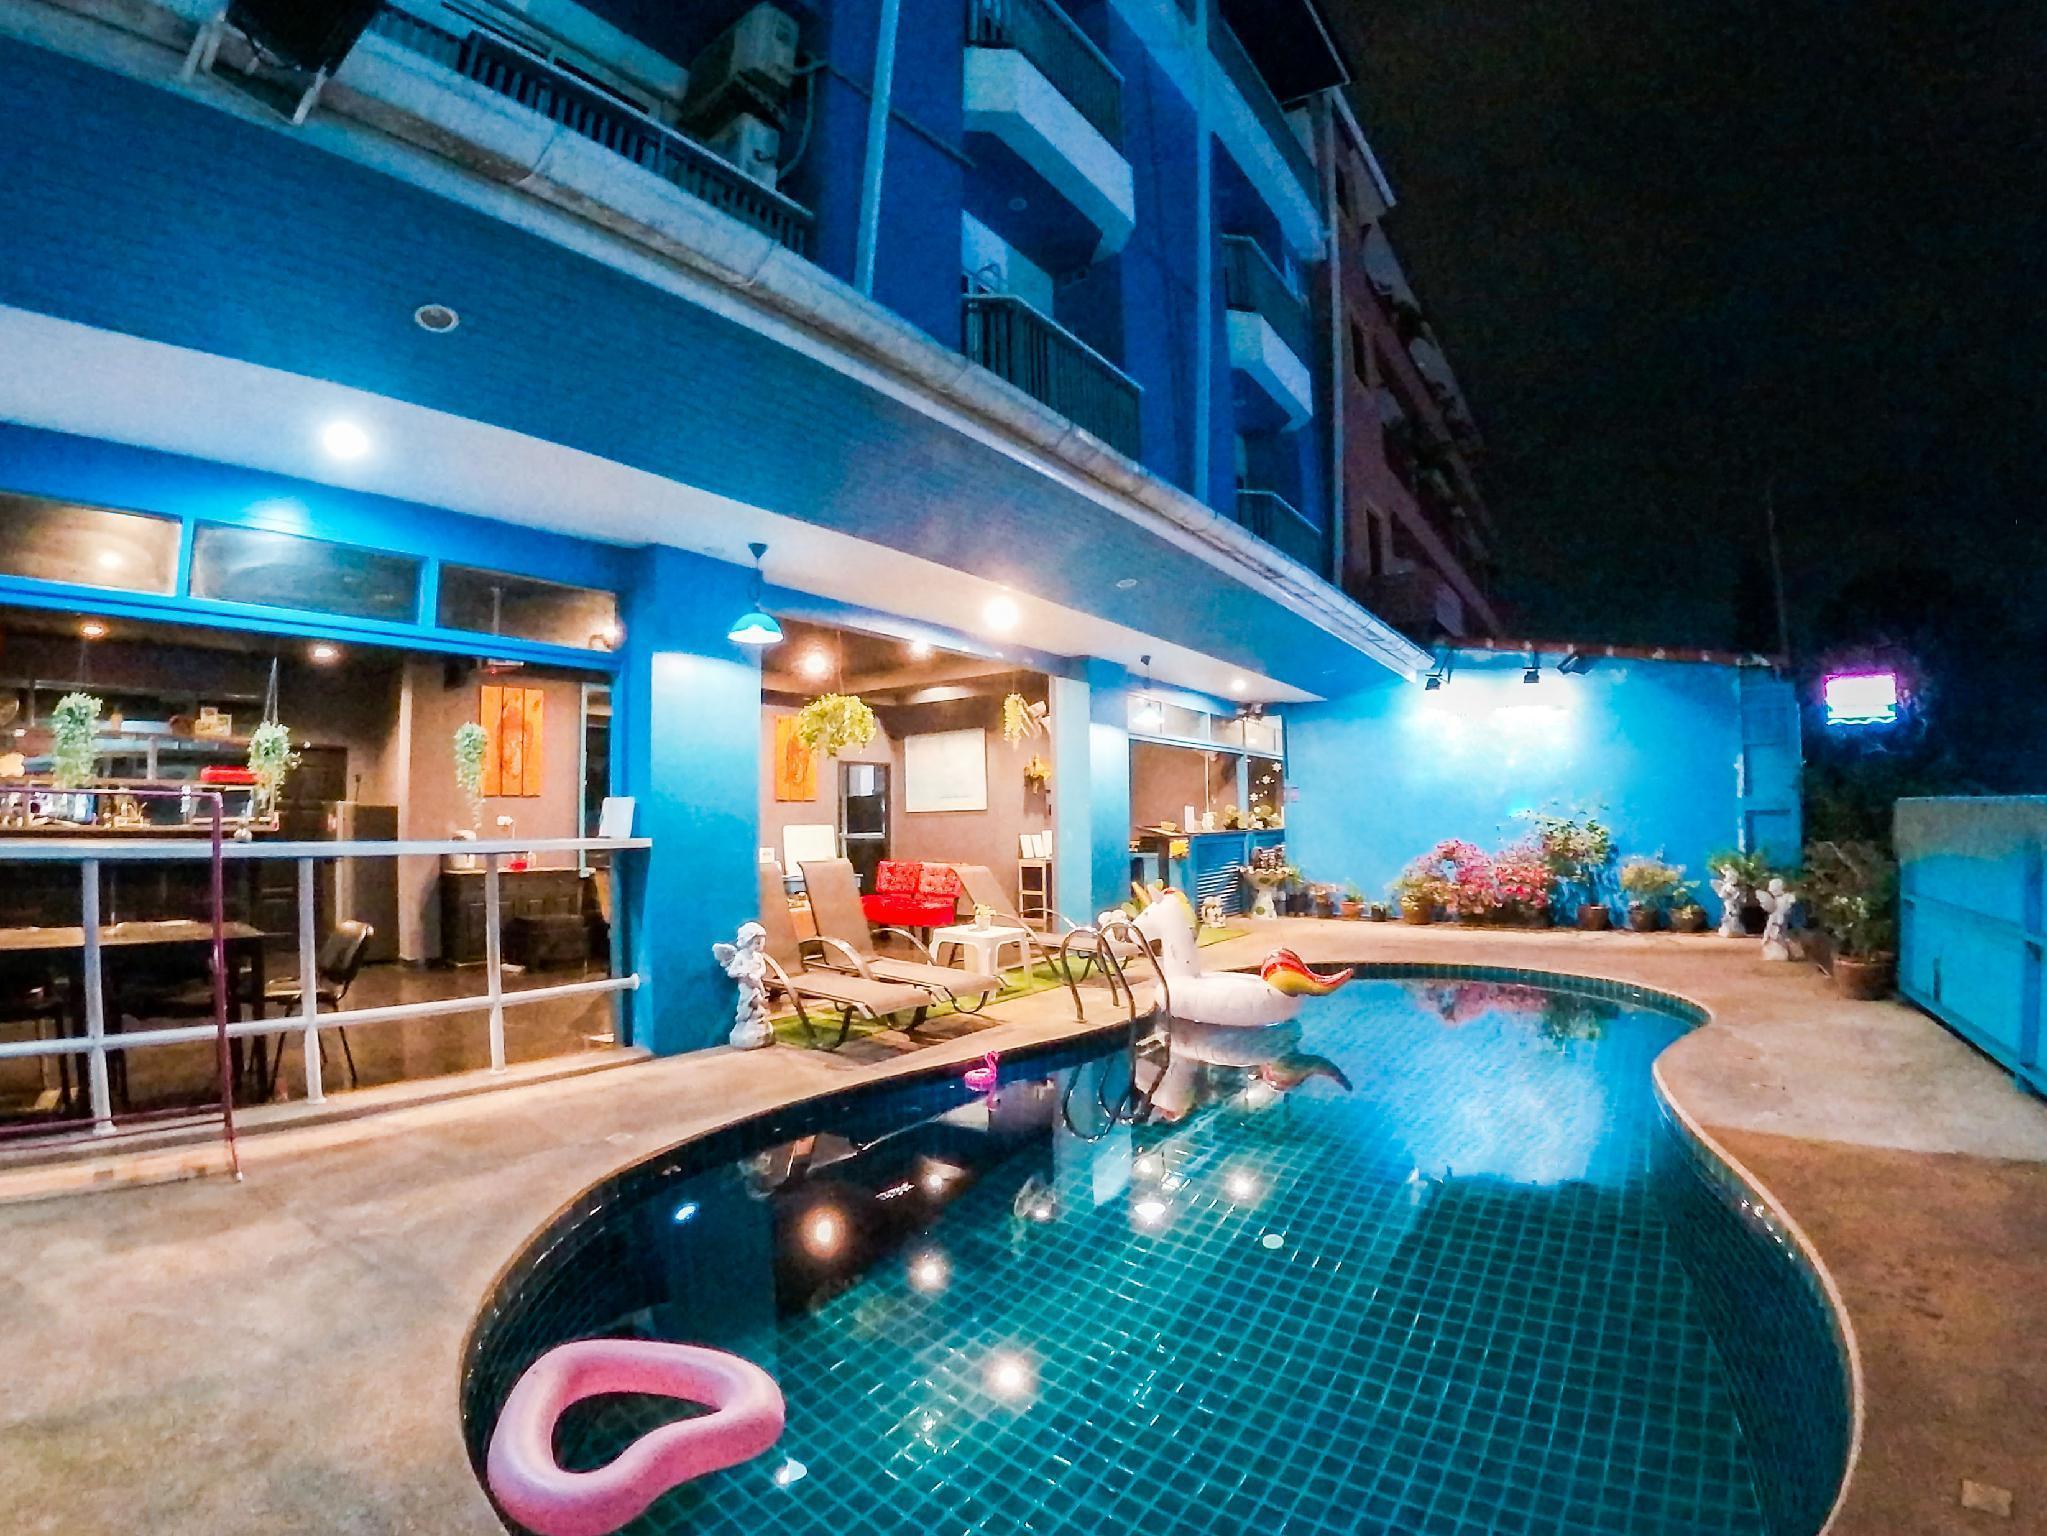 The Bluewaves Home 19BR w/Private Pool in Patong วิลลา 19 ห้องนอน 19 ห้องน้ำส่วนตัว ขนาด 320 ตร.ม. – ป่าตอง